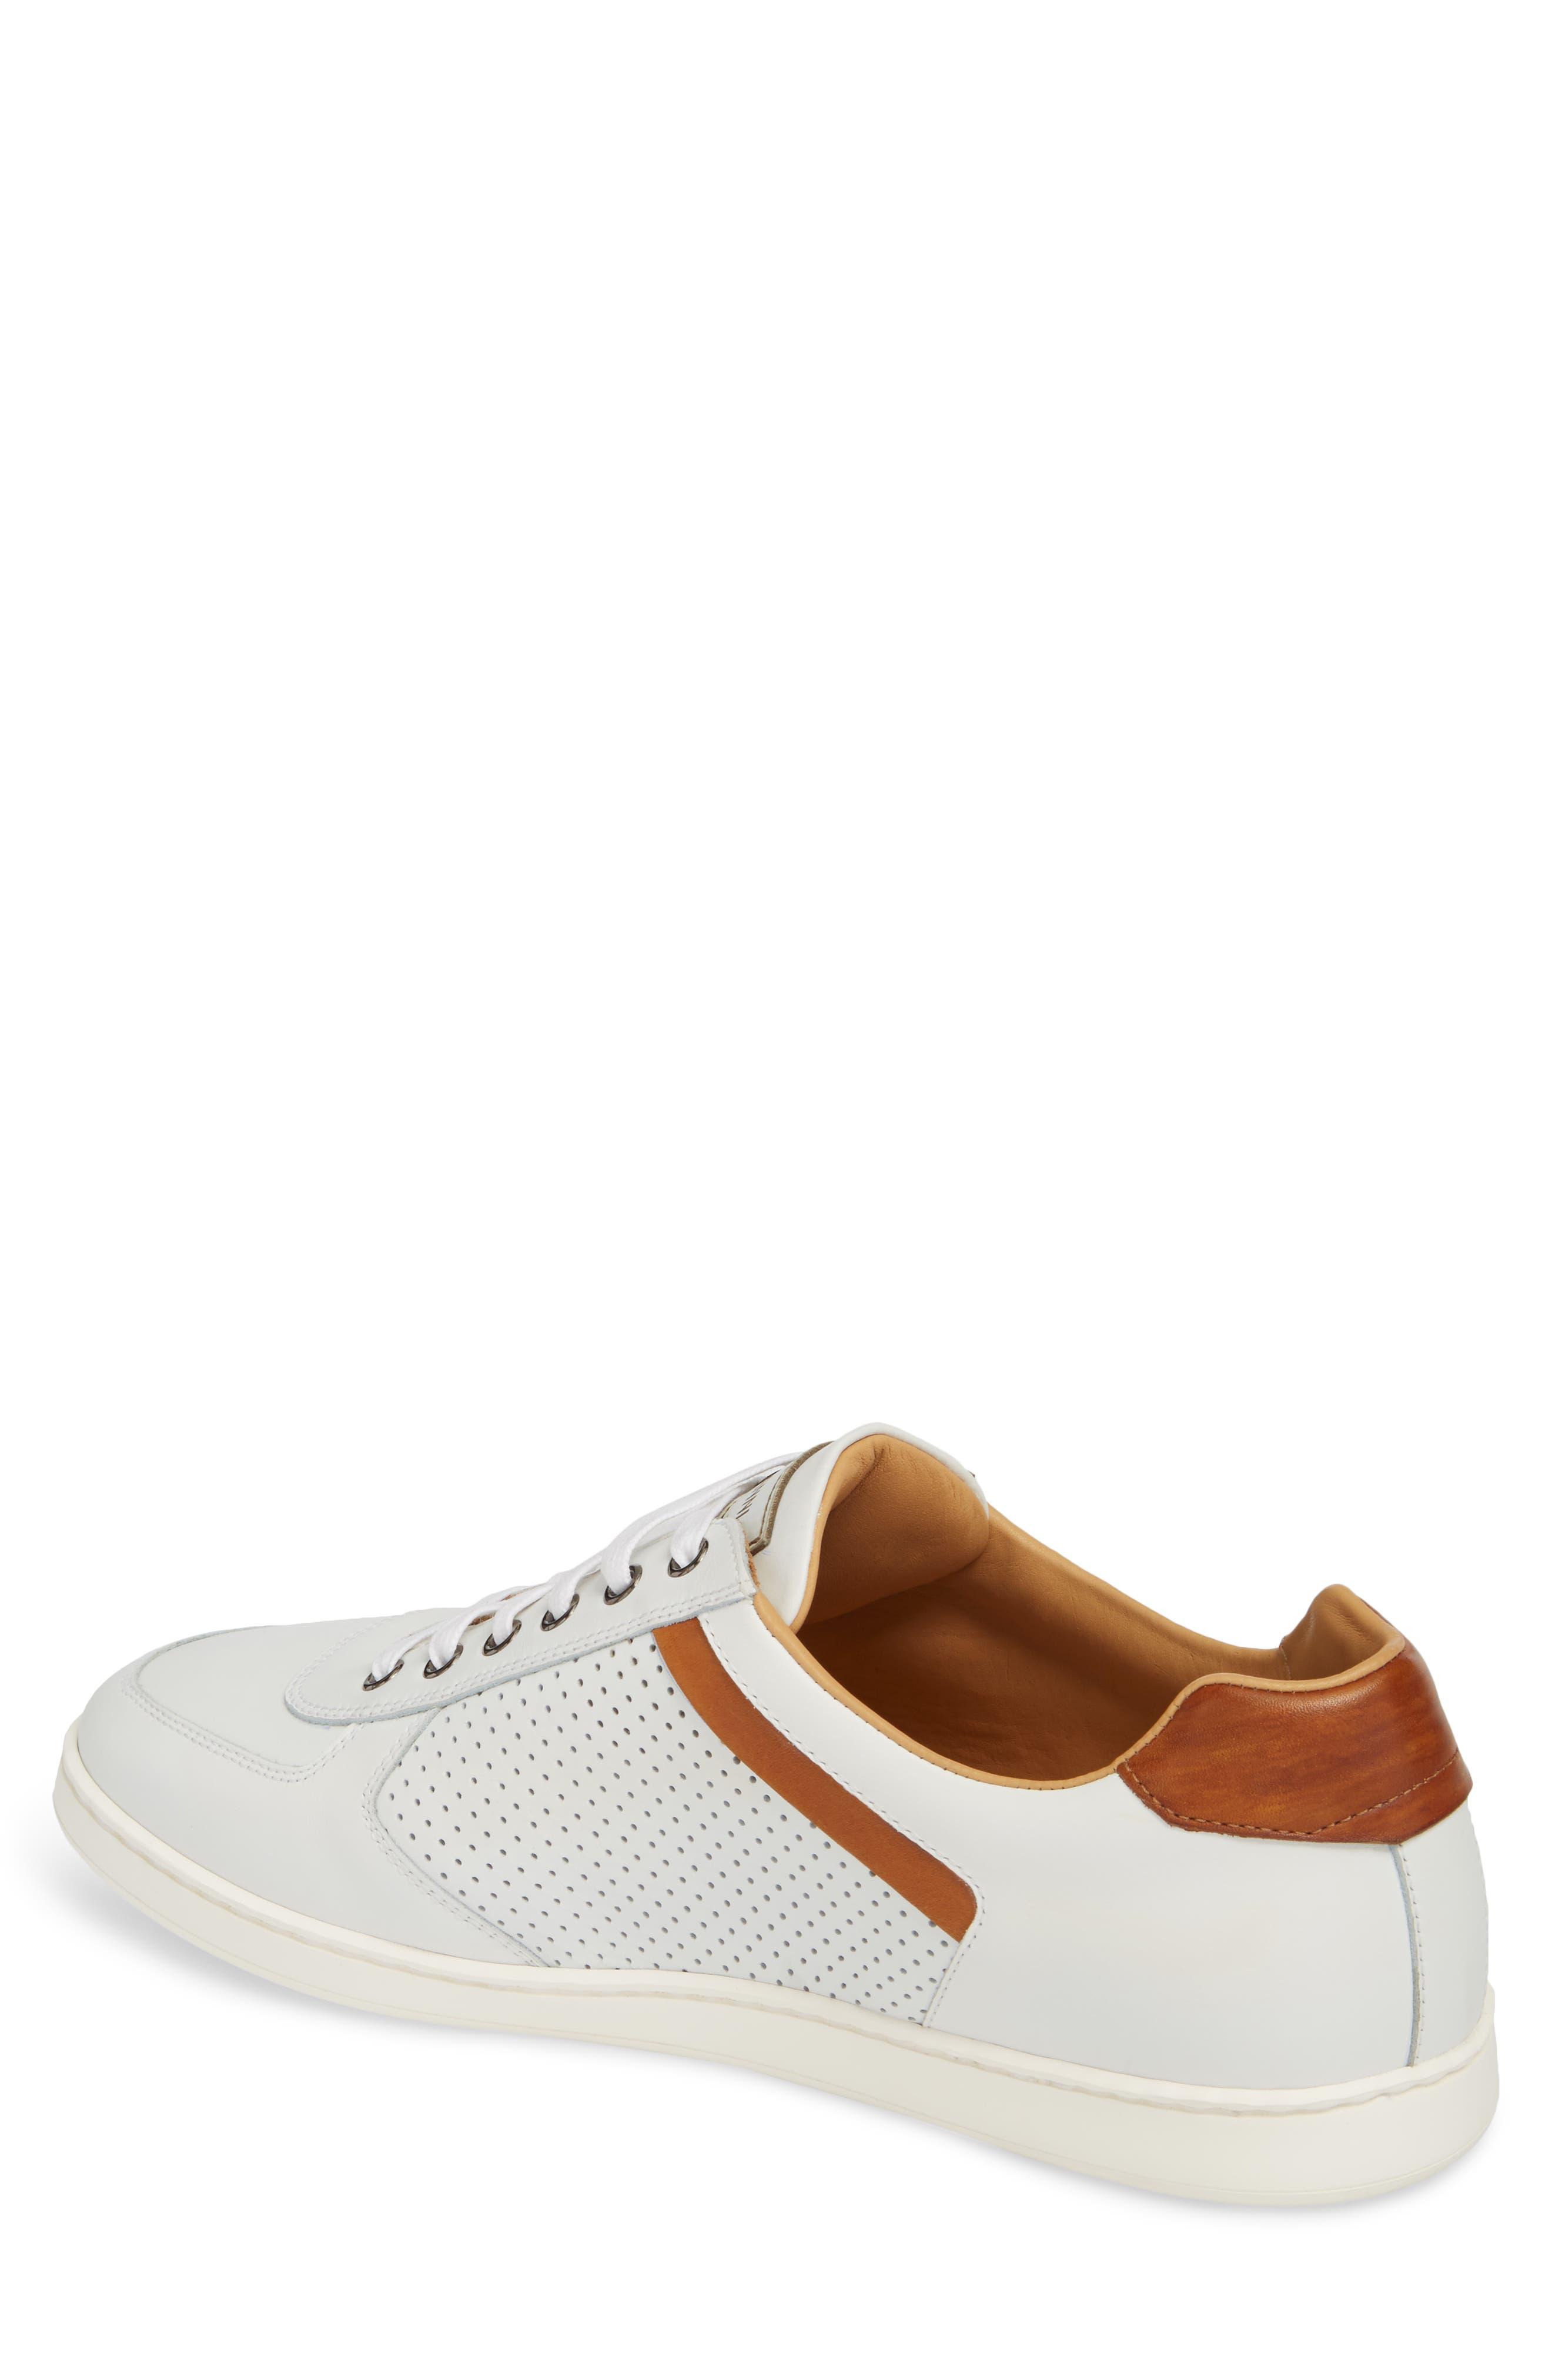 Echo Sneaker,                             Alternate thumbnail 2, color,                             100